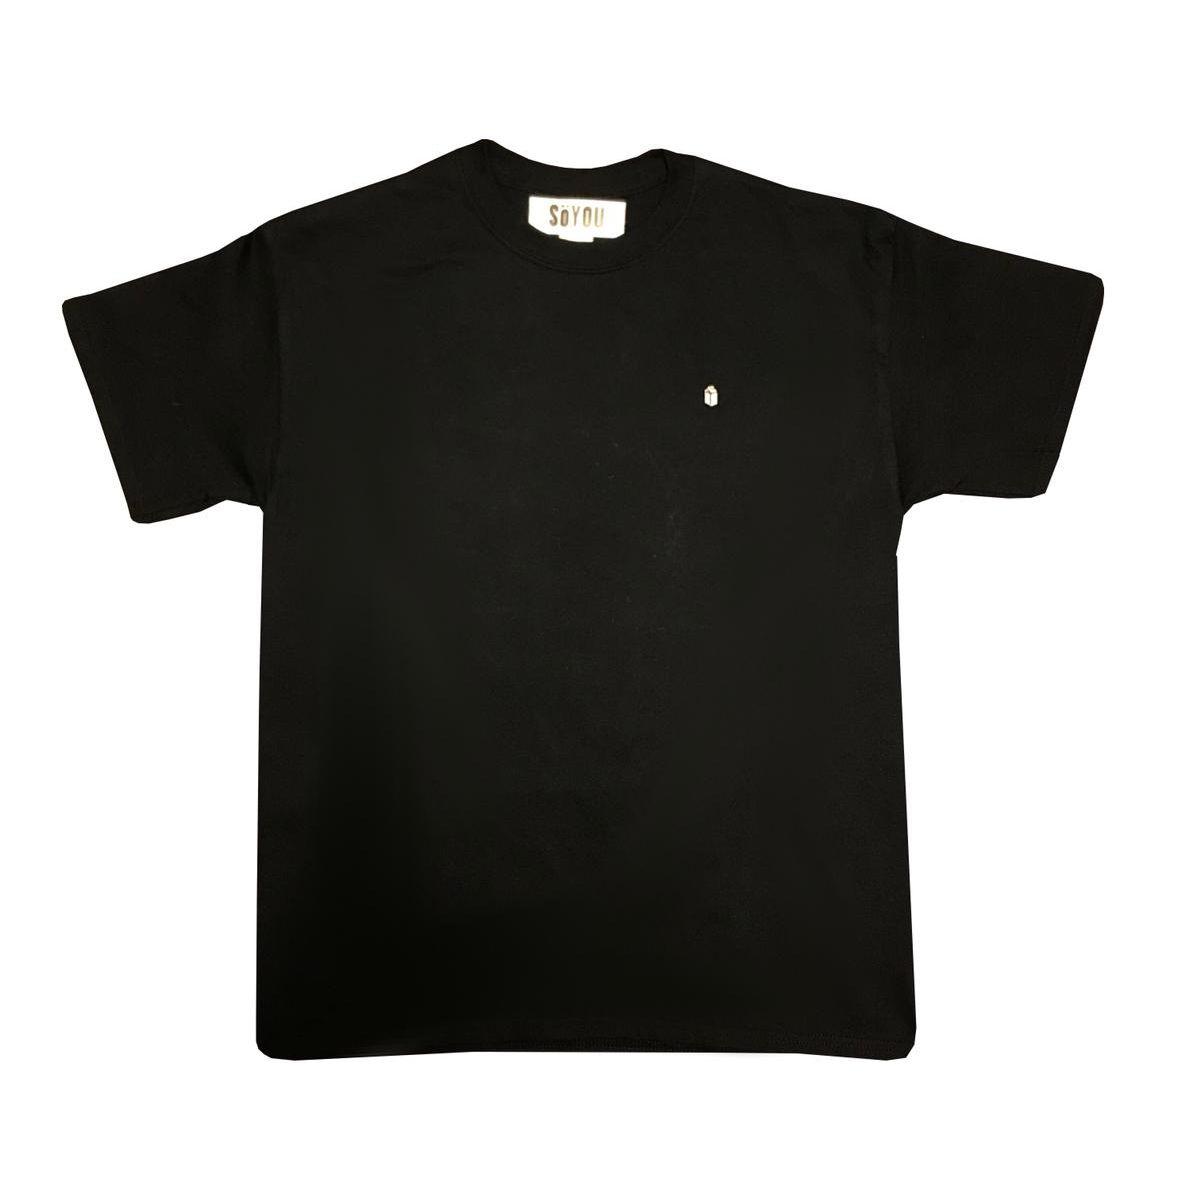 SoYou Clothing Basics T-Shirt in Black